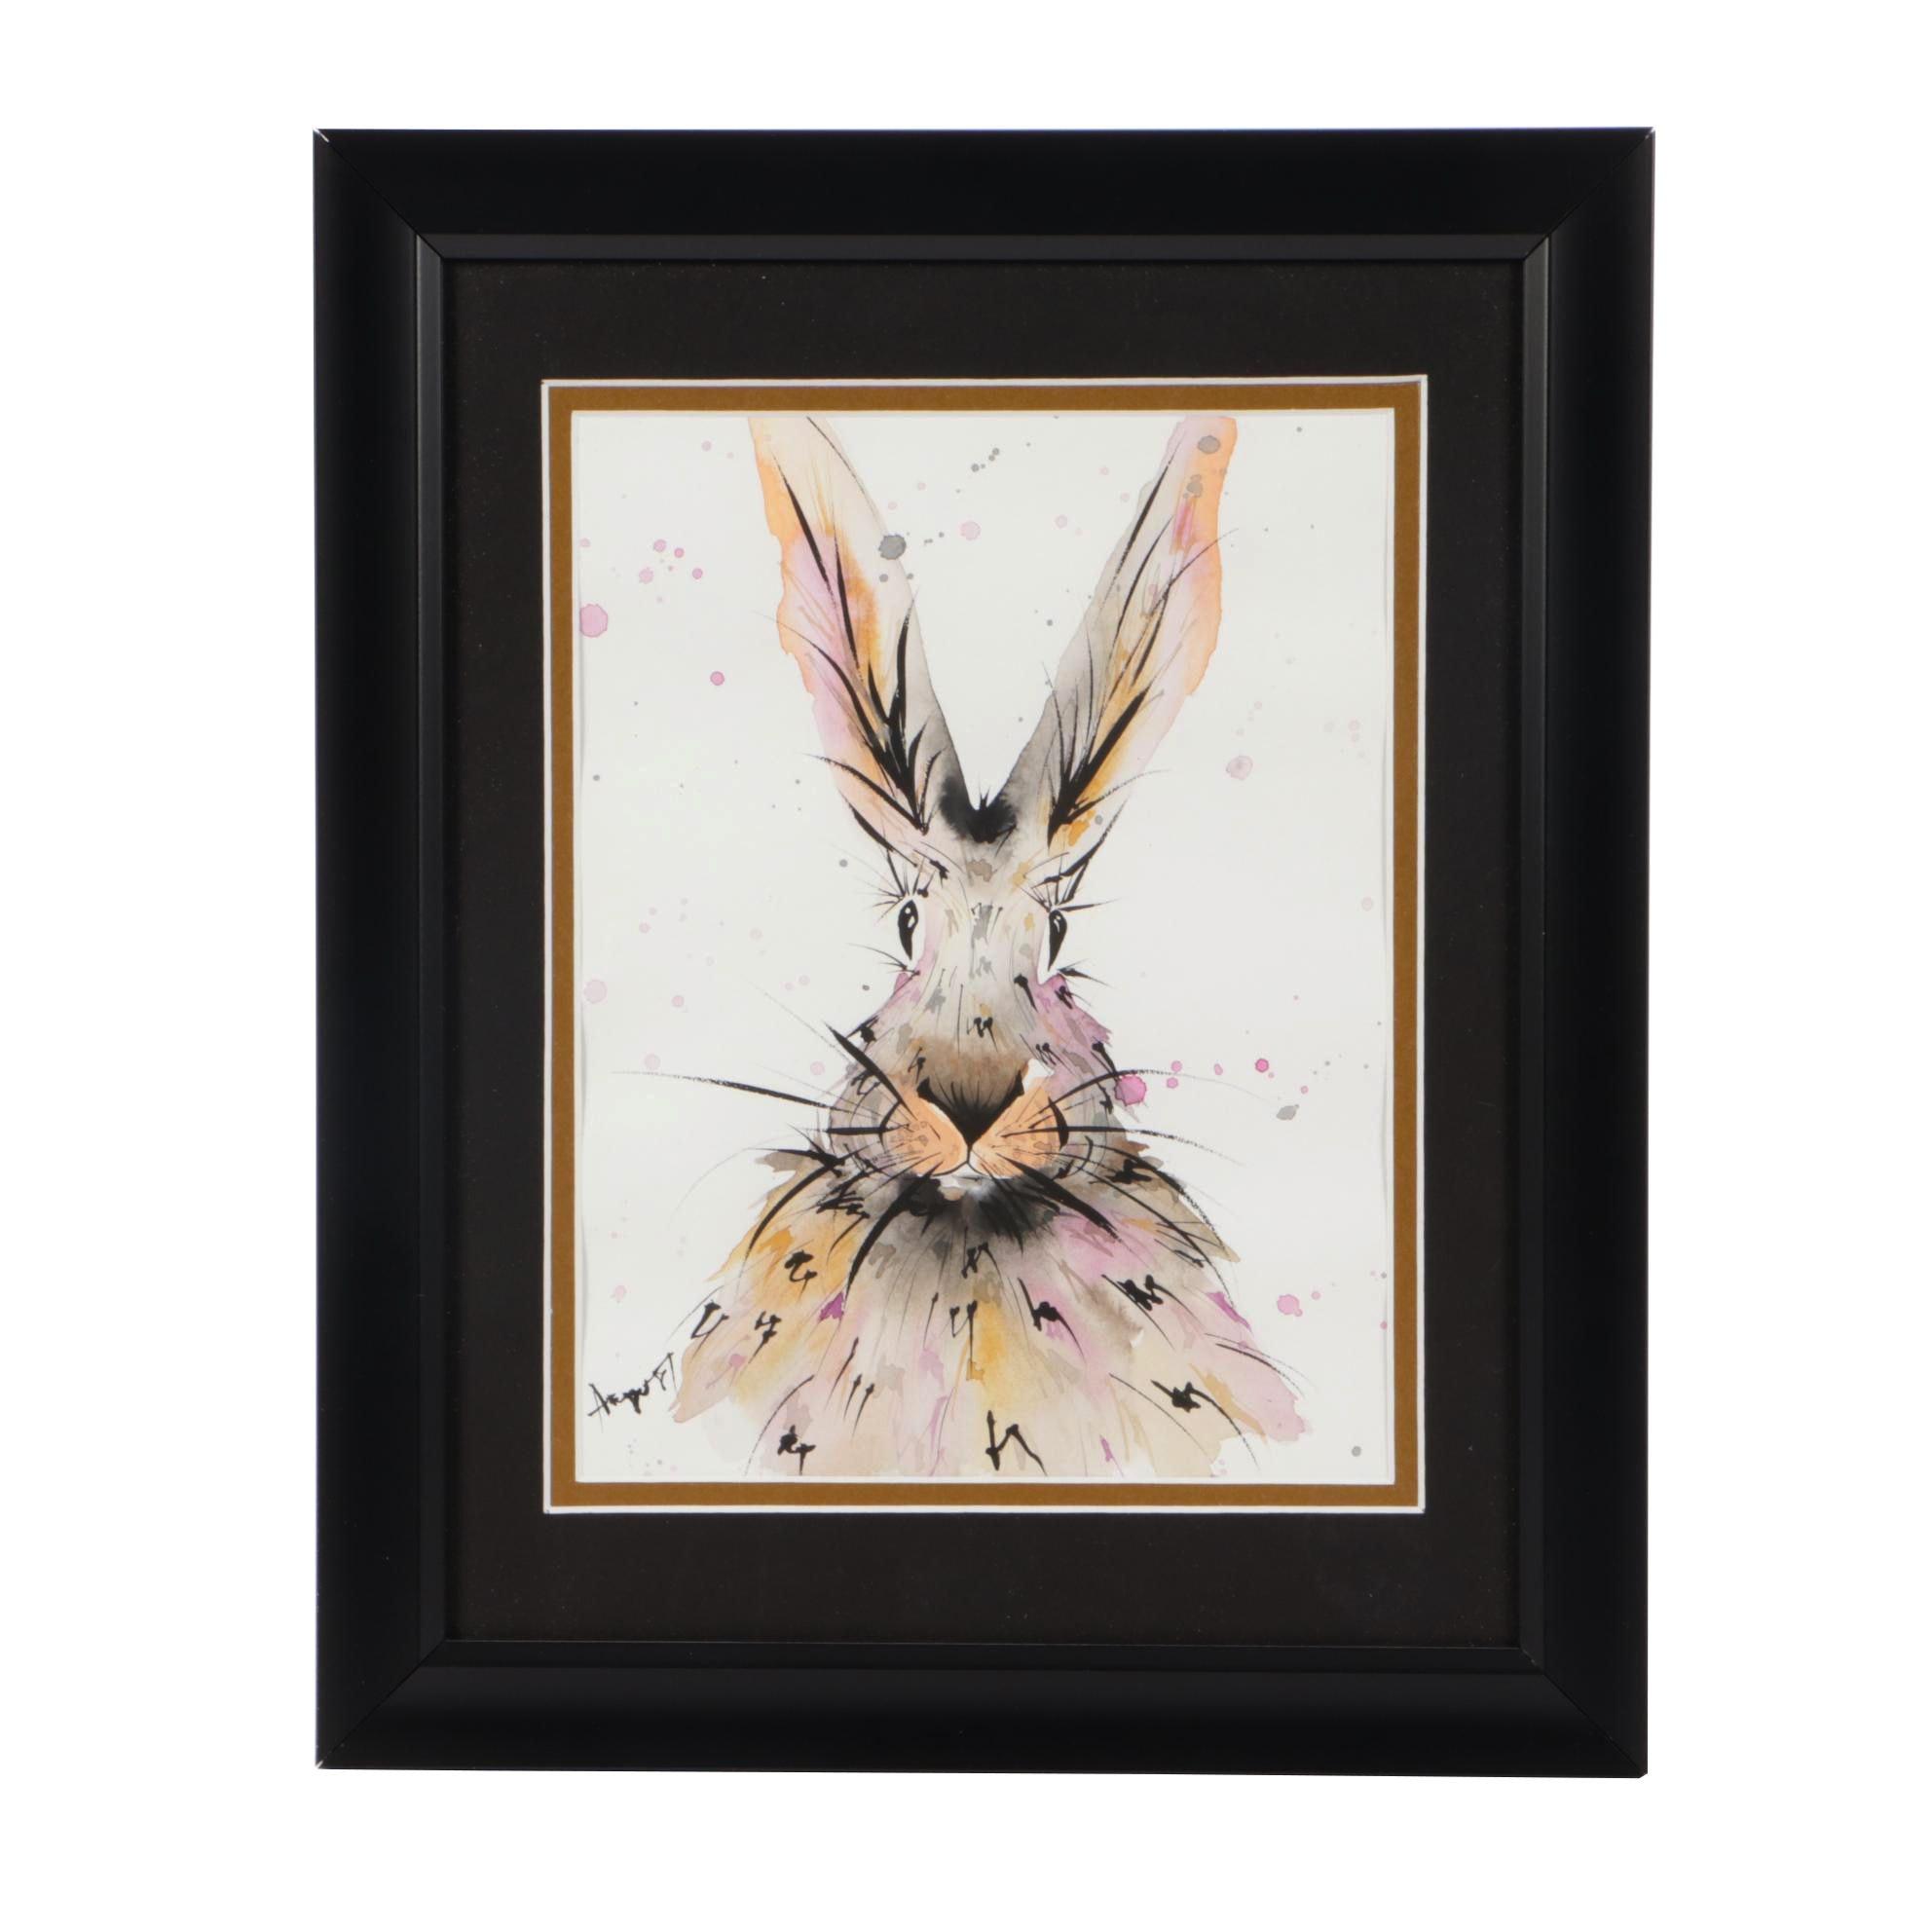 Angor Contemporary Gouache and Watercolor Rabbit Illustration